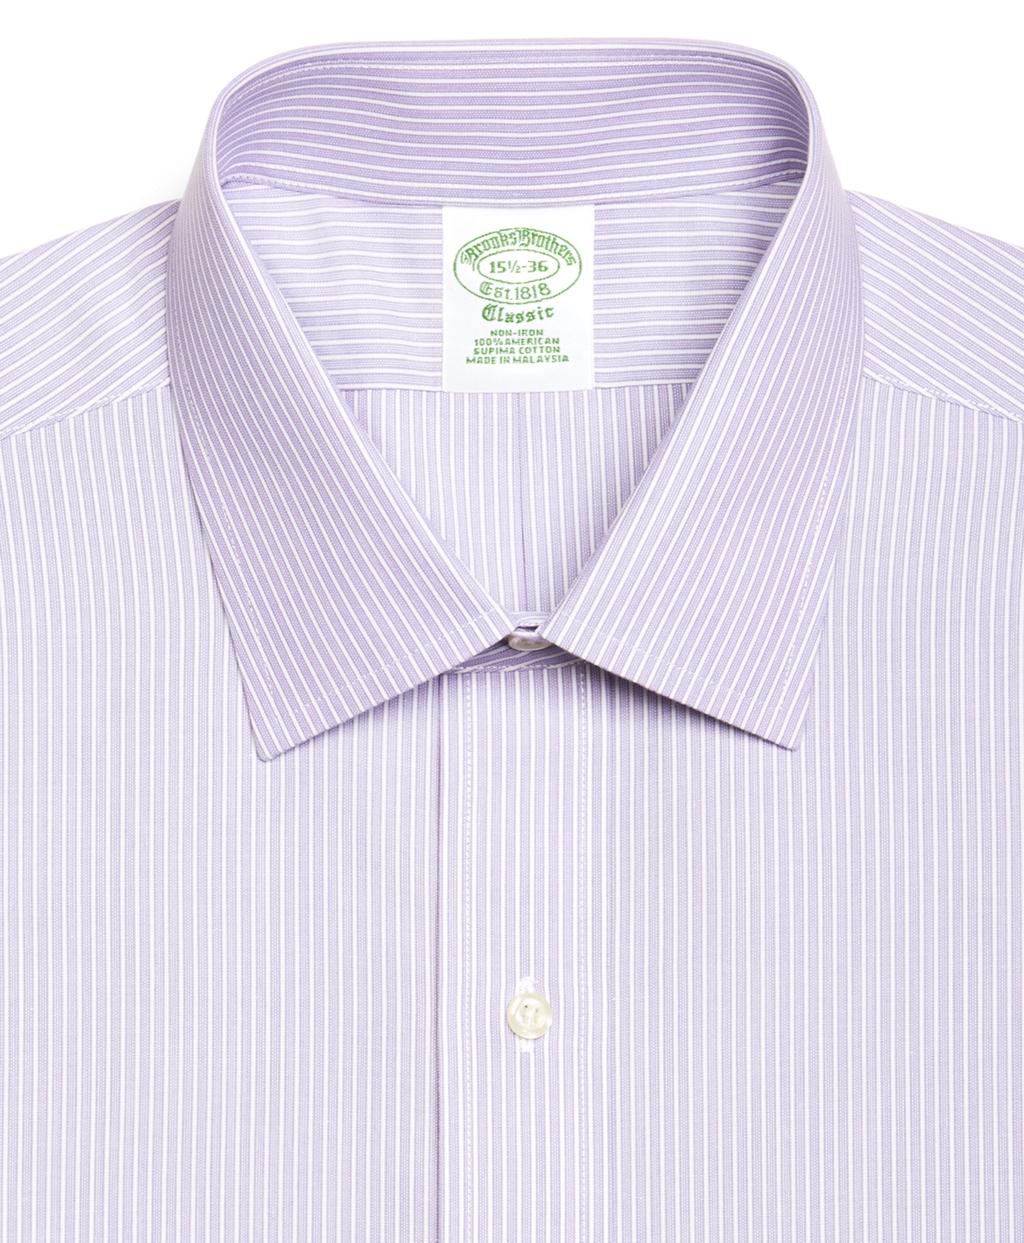 Lyst brooks brothers supima cotton noniron regular fit for Supima cotton dress shirts